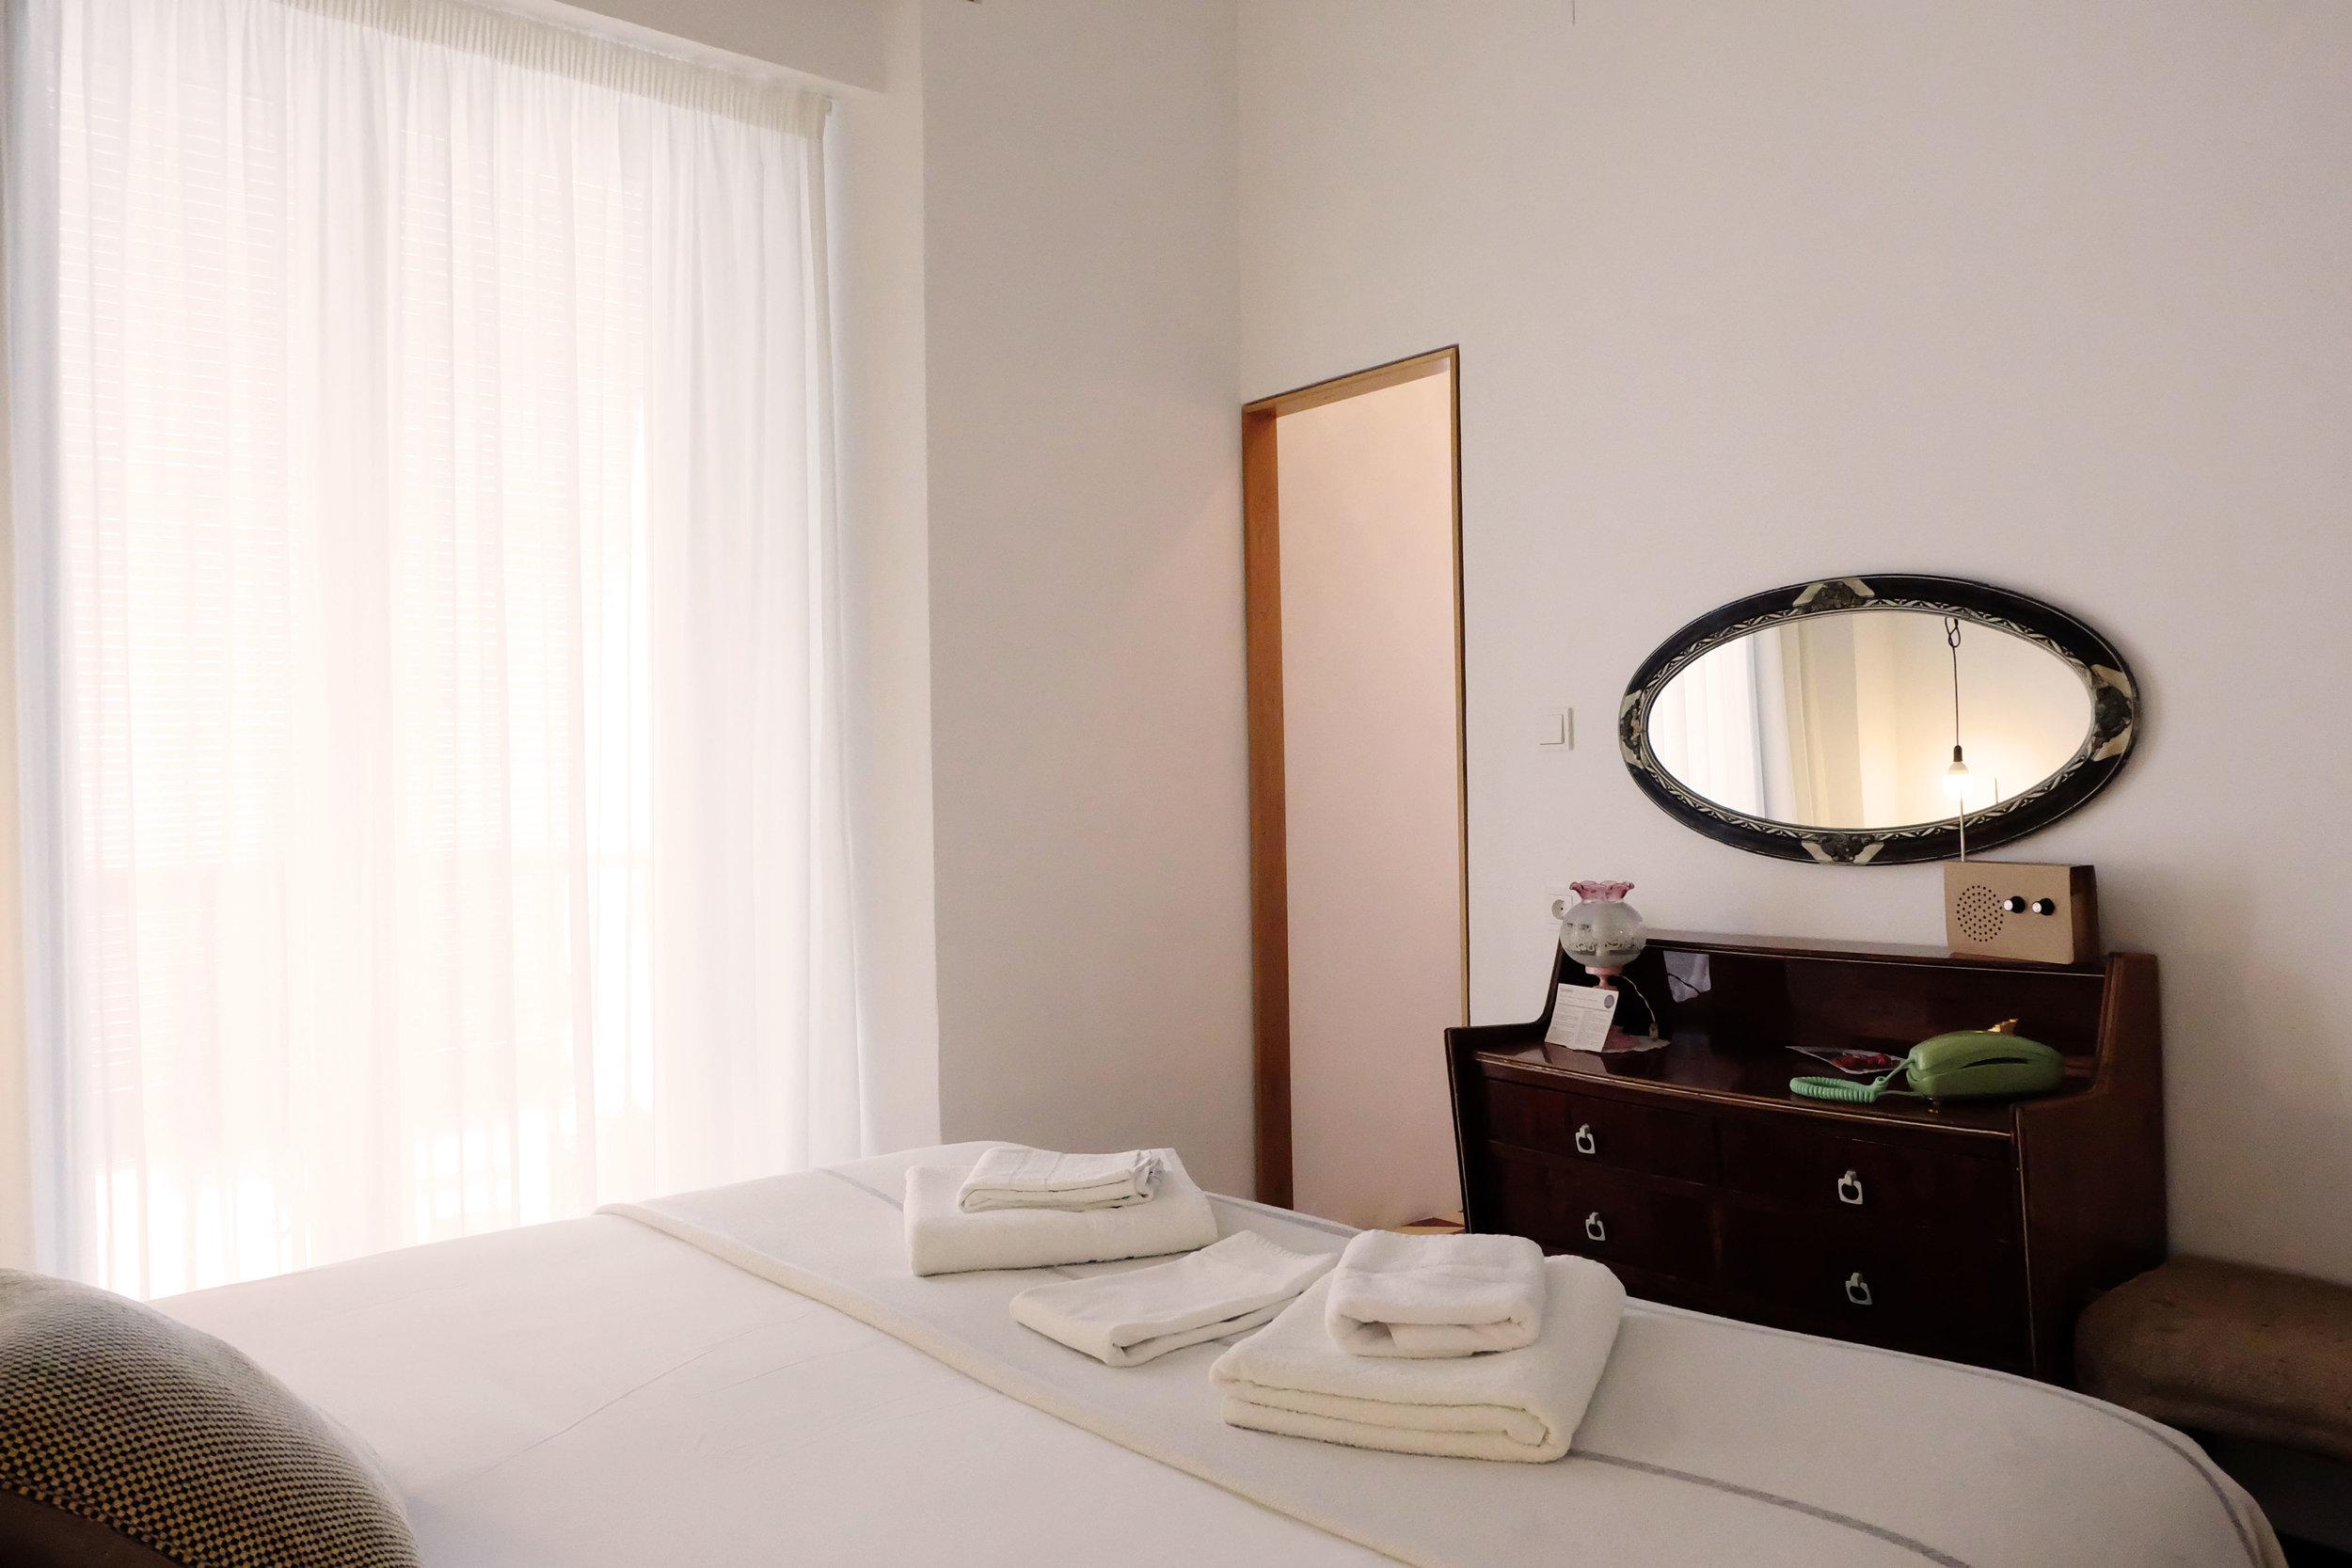 Hotel-Casa-de-huespedes-santa-maria-Habitacion-8-8.JPG